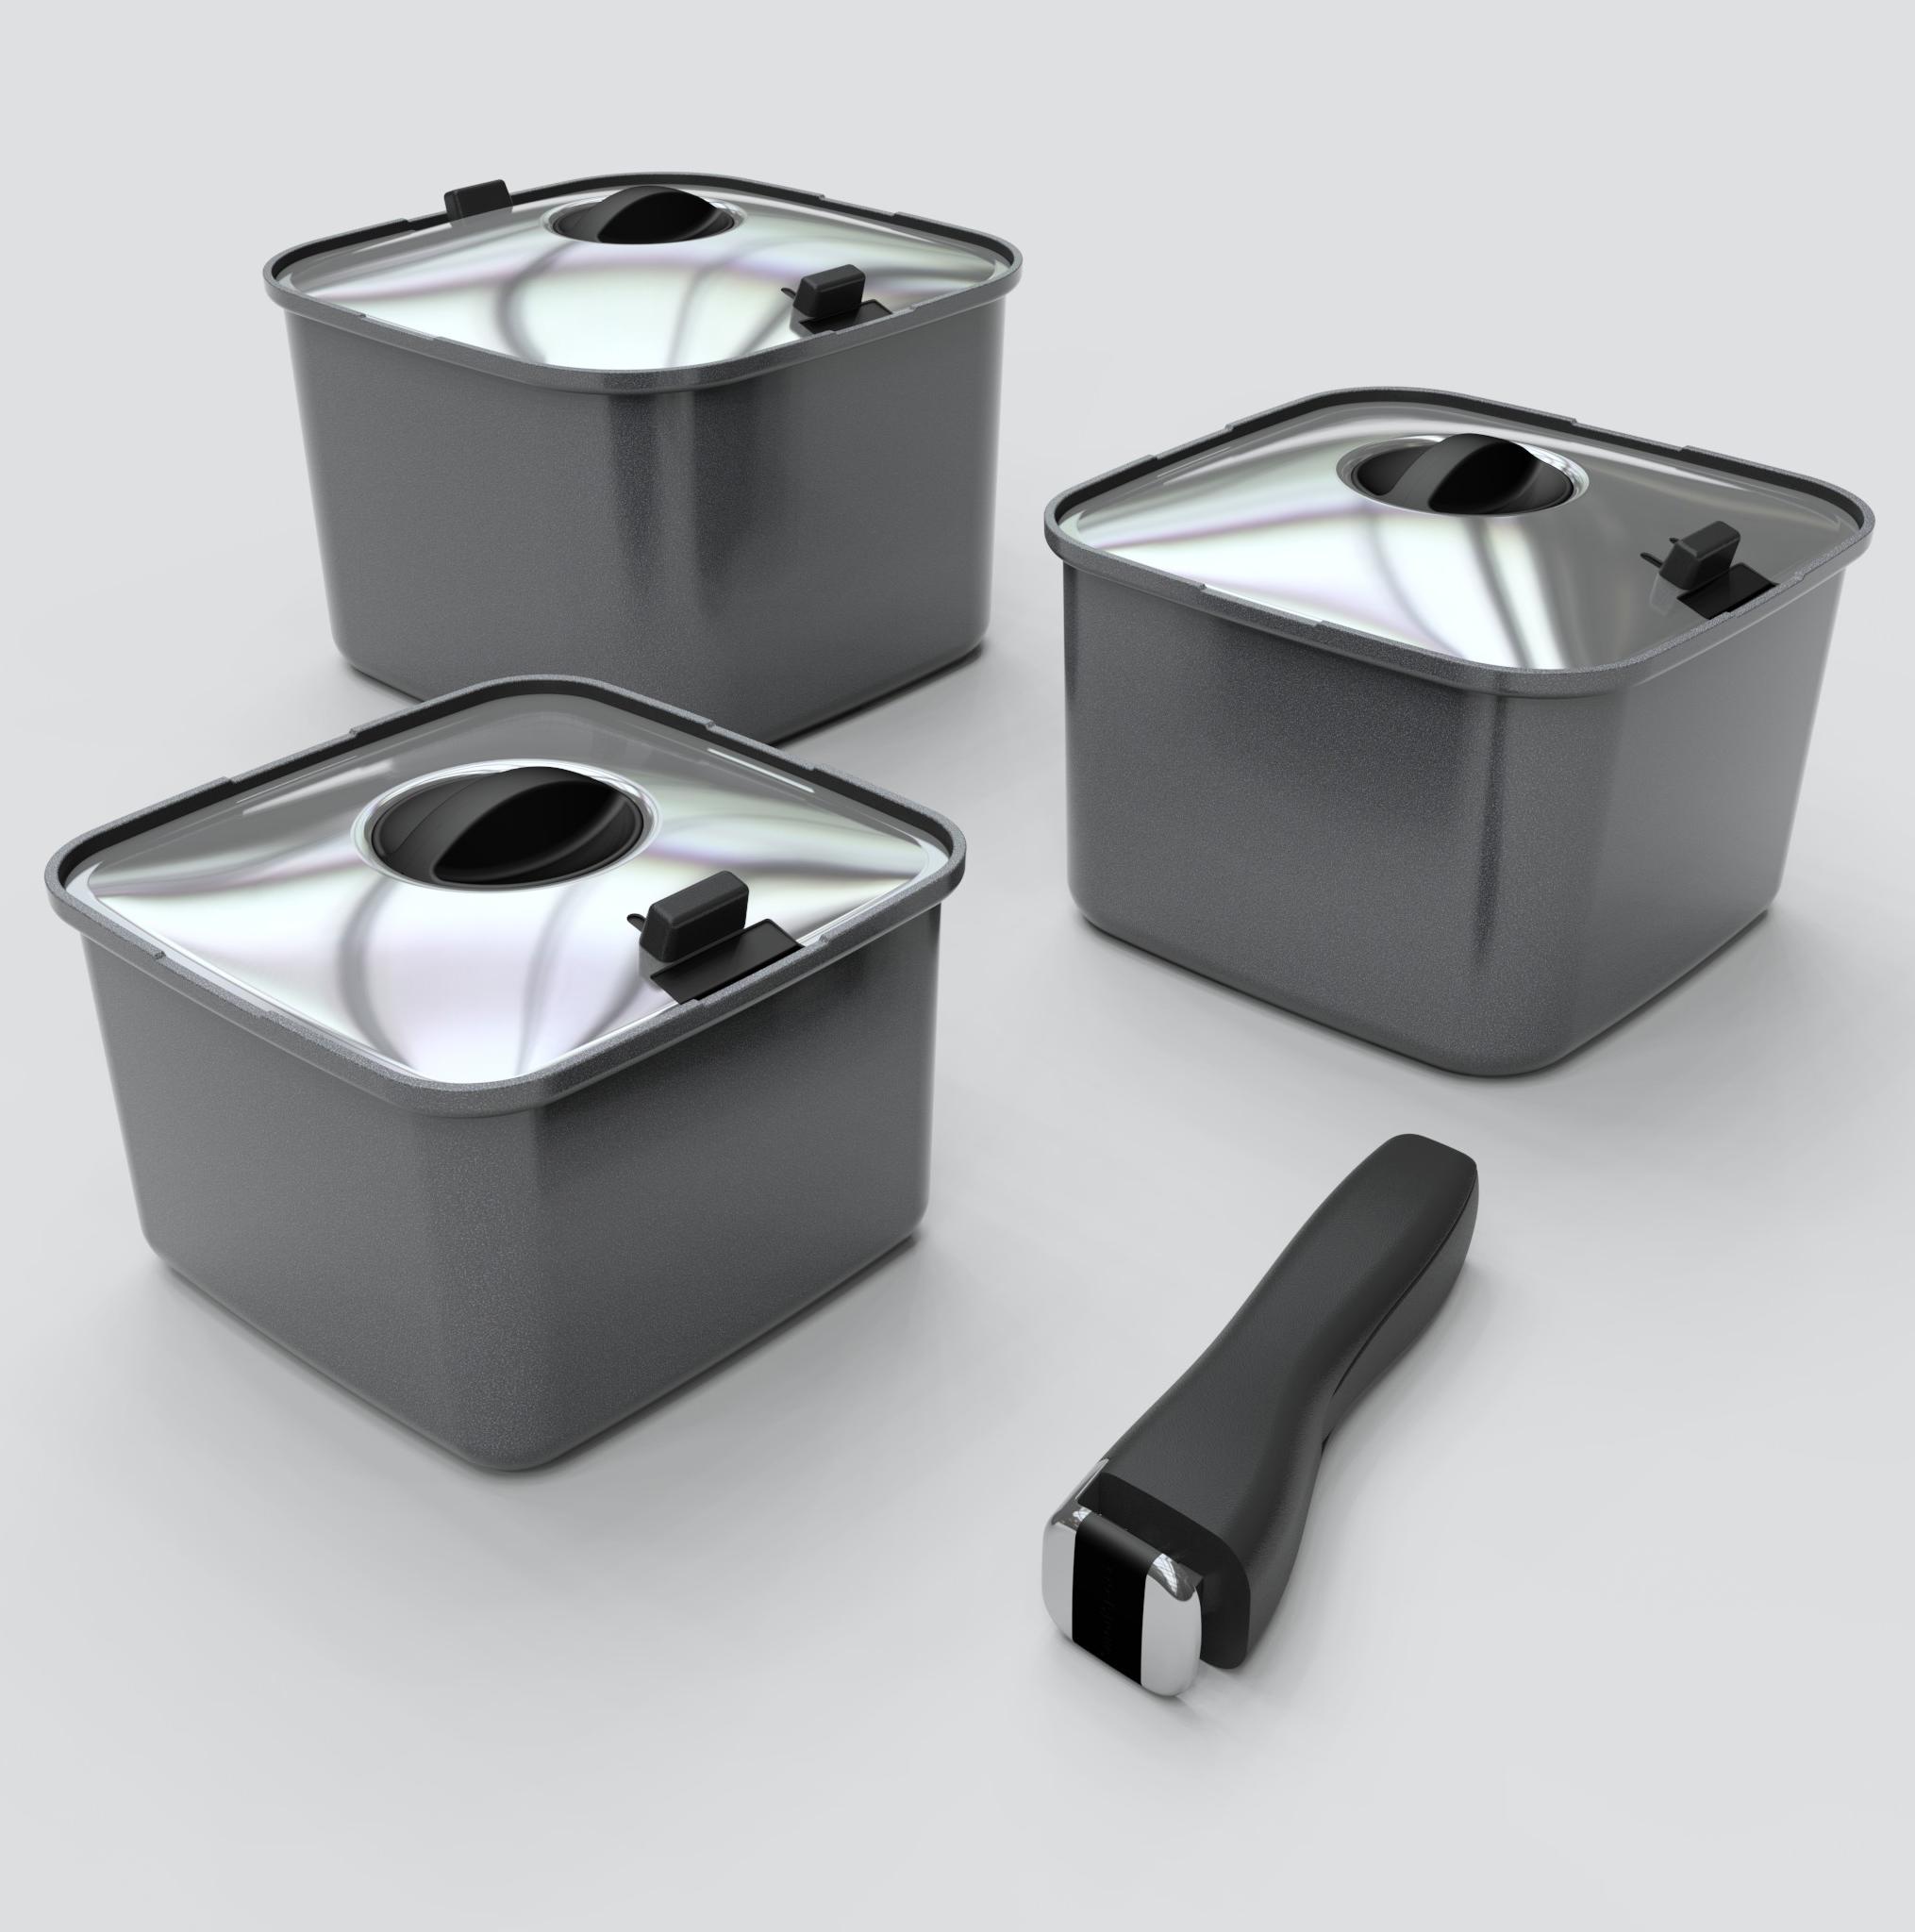 Smartspace Cookware